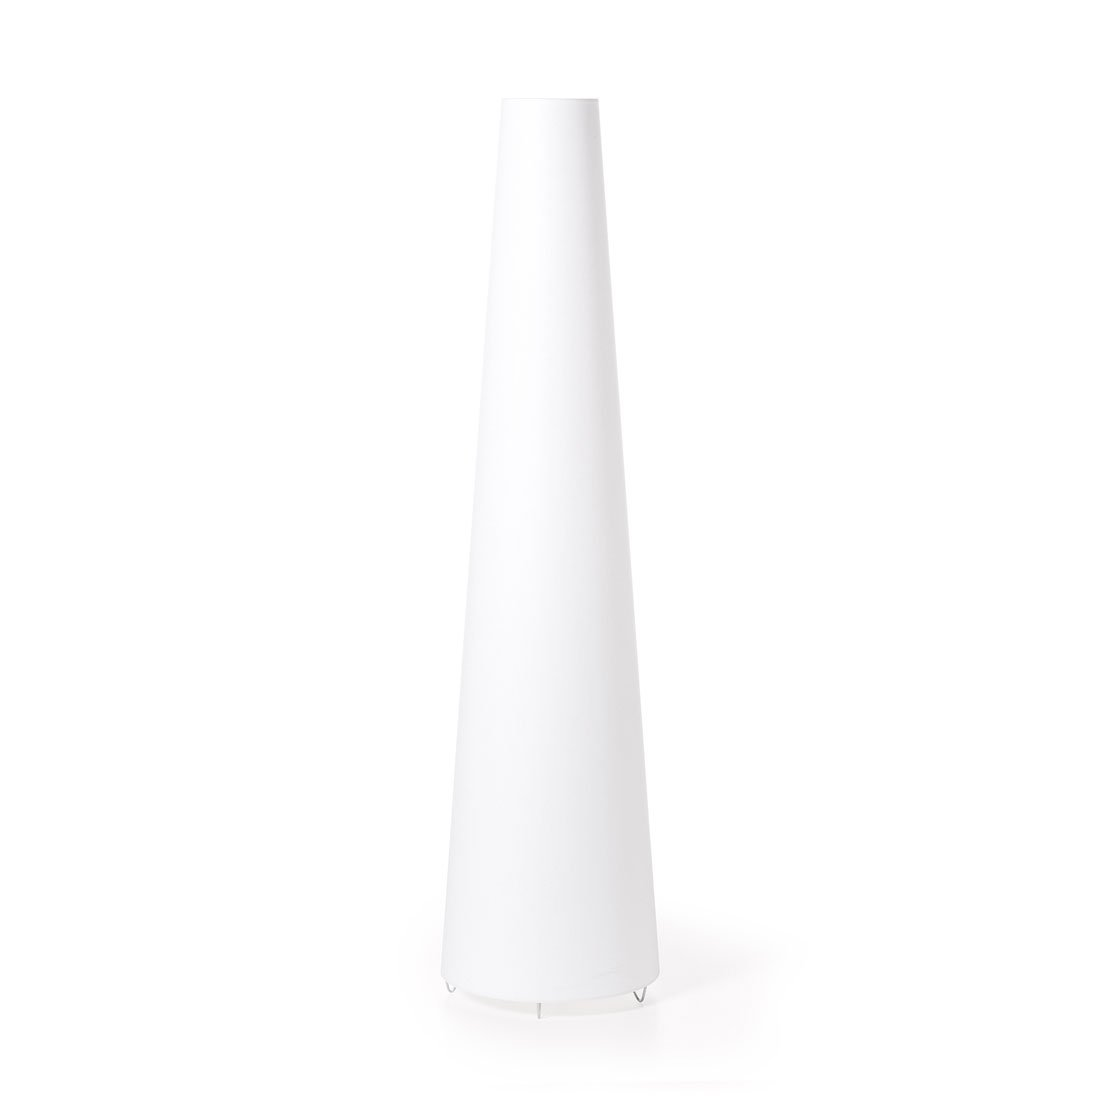 Moooi Trix Vloerlamp